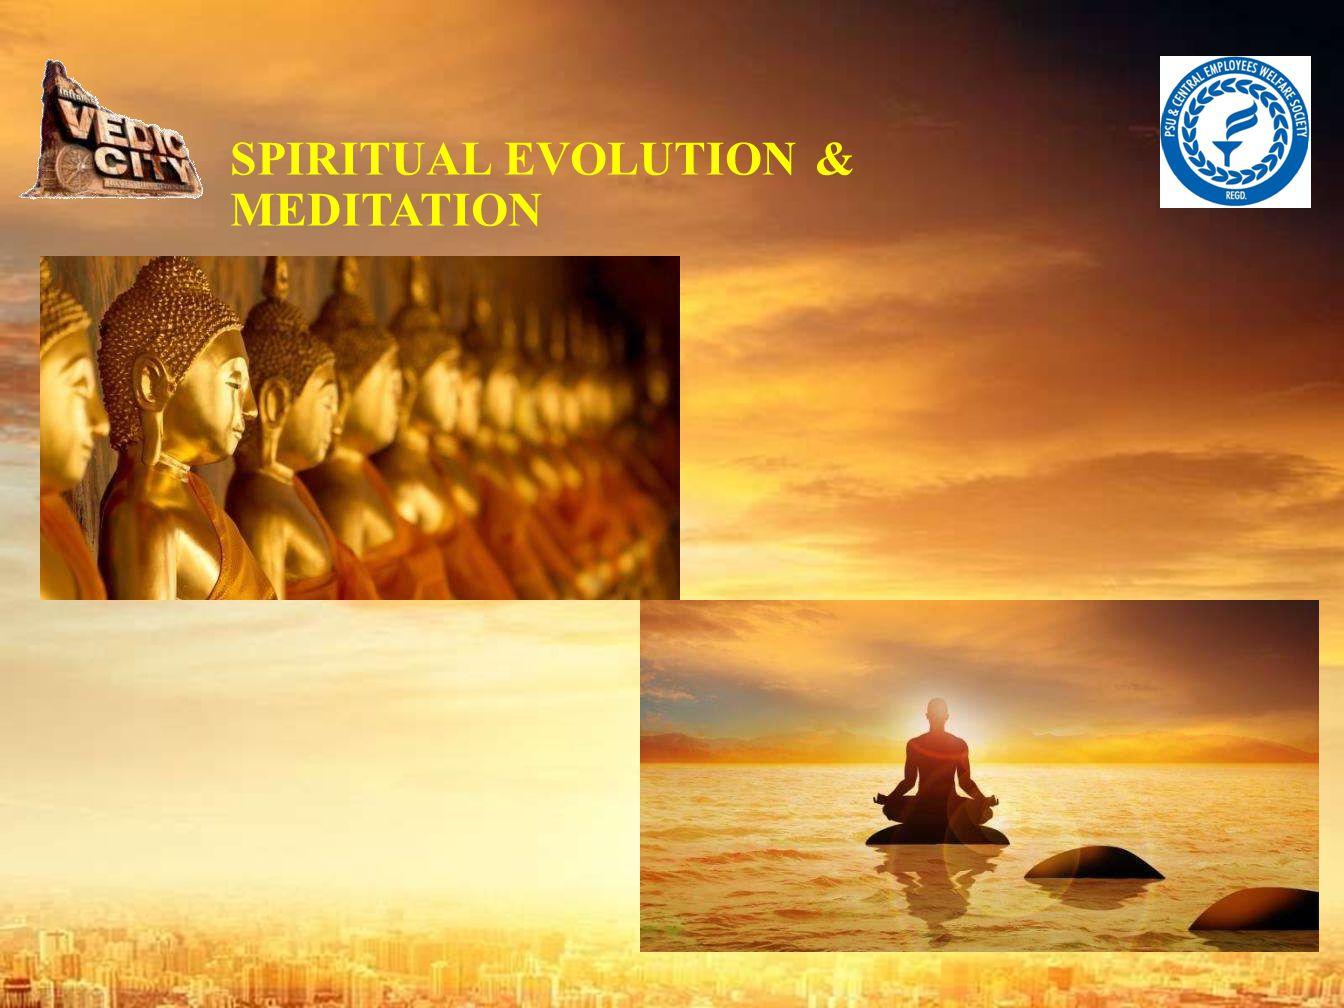 SPIRITUAL EVOLUTION & MEDITATION